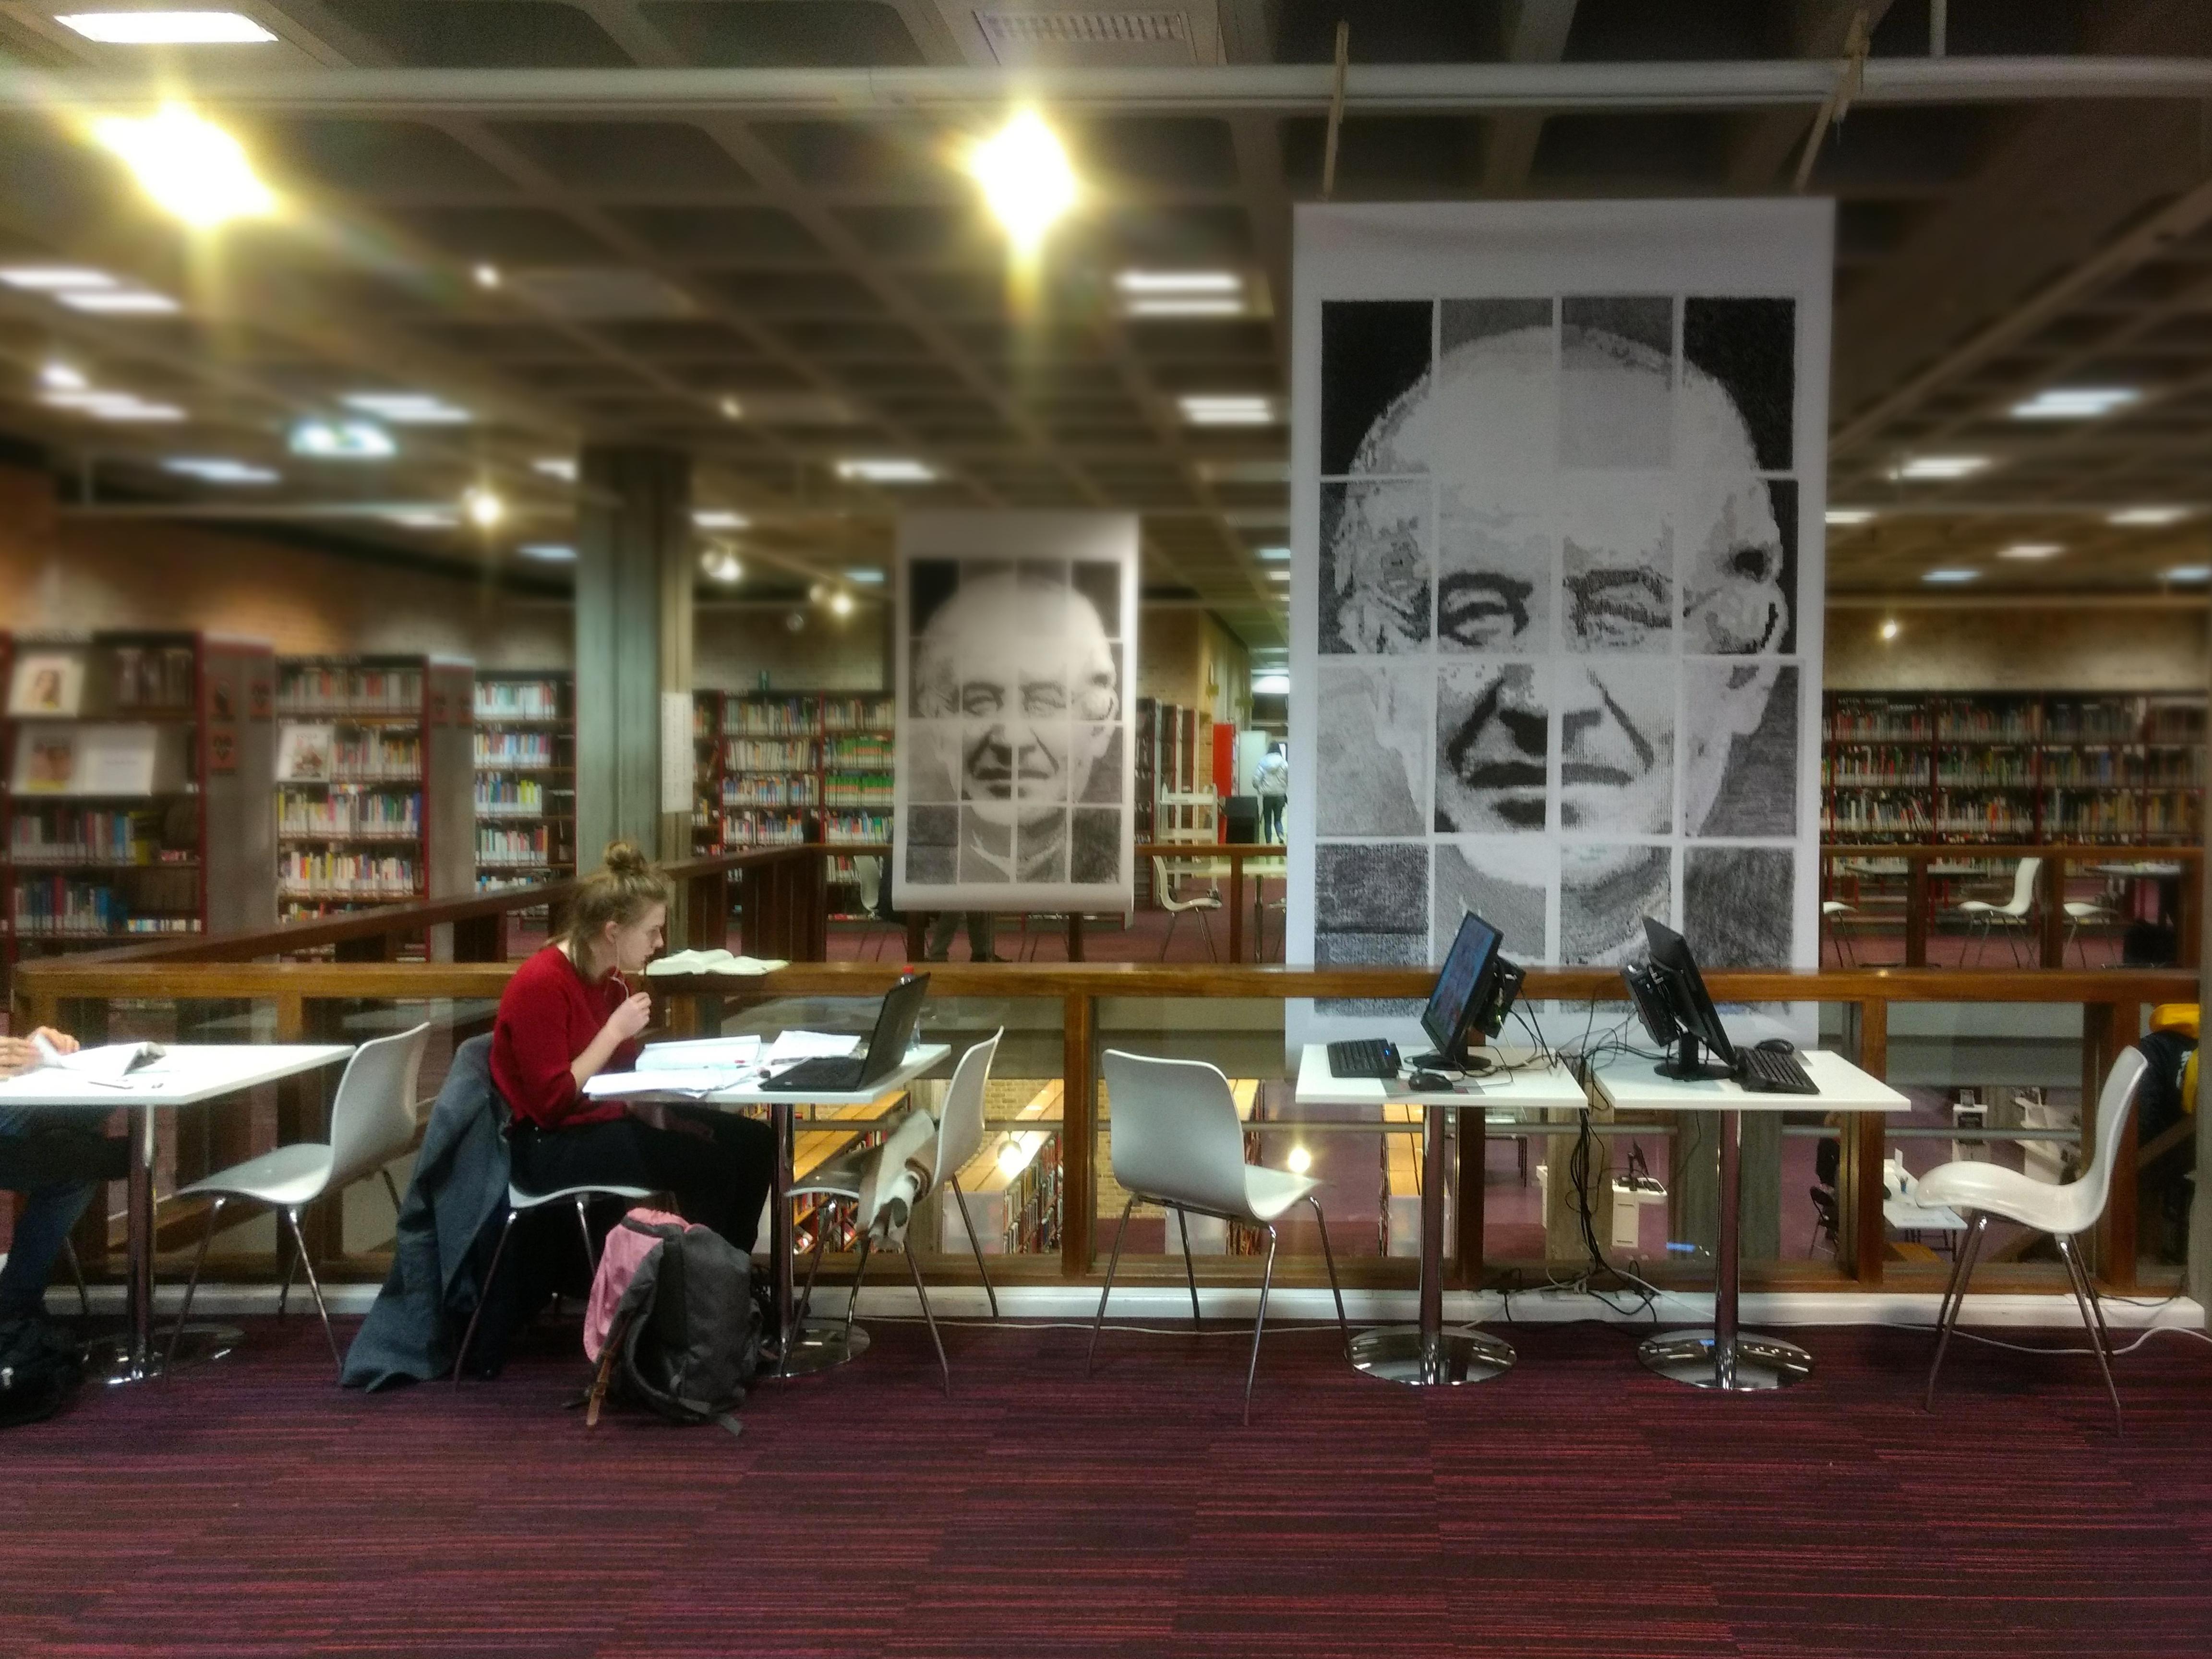 Foto Atelier Gezelle tentoonstelling in Hoofdbibliotheek Biekorf